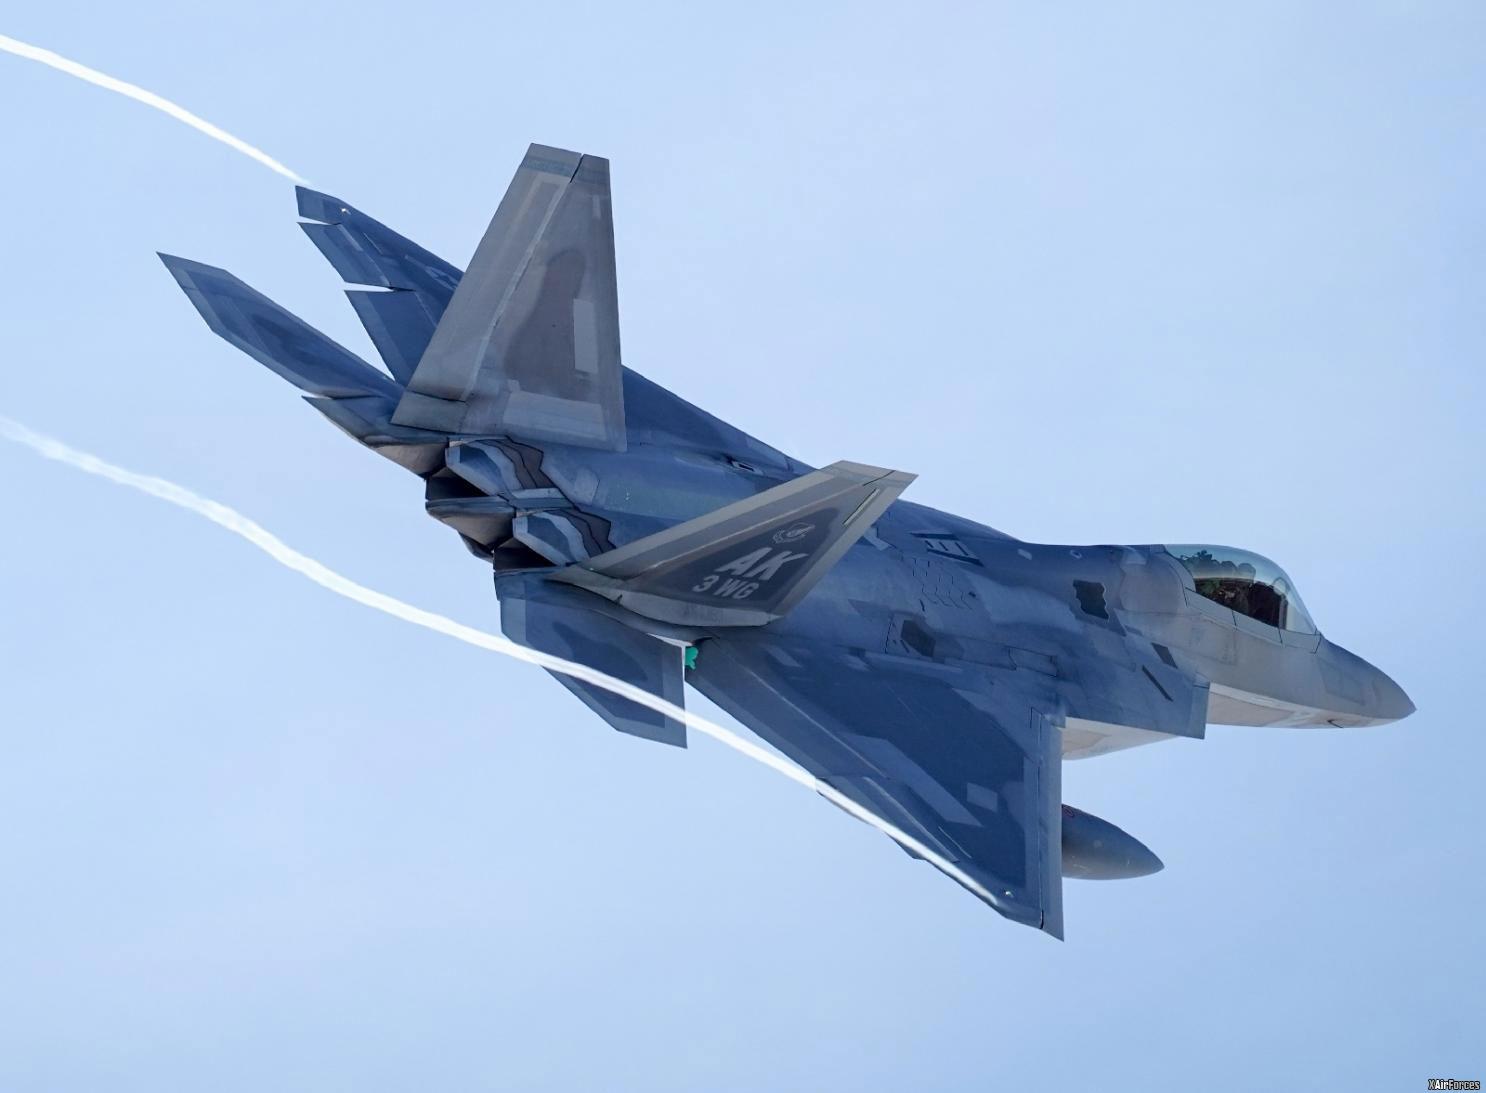 U.S. Air Force F-22 Raptor